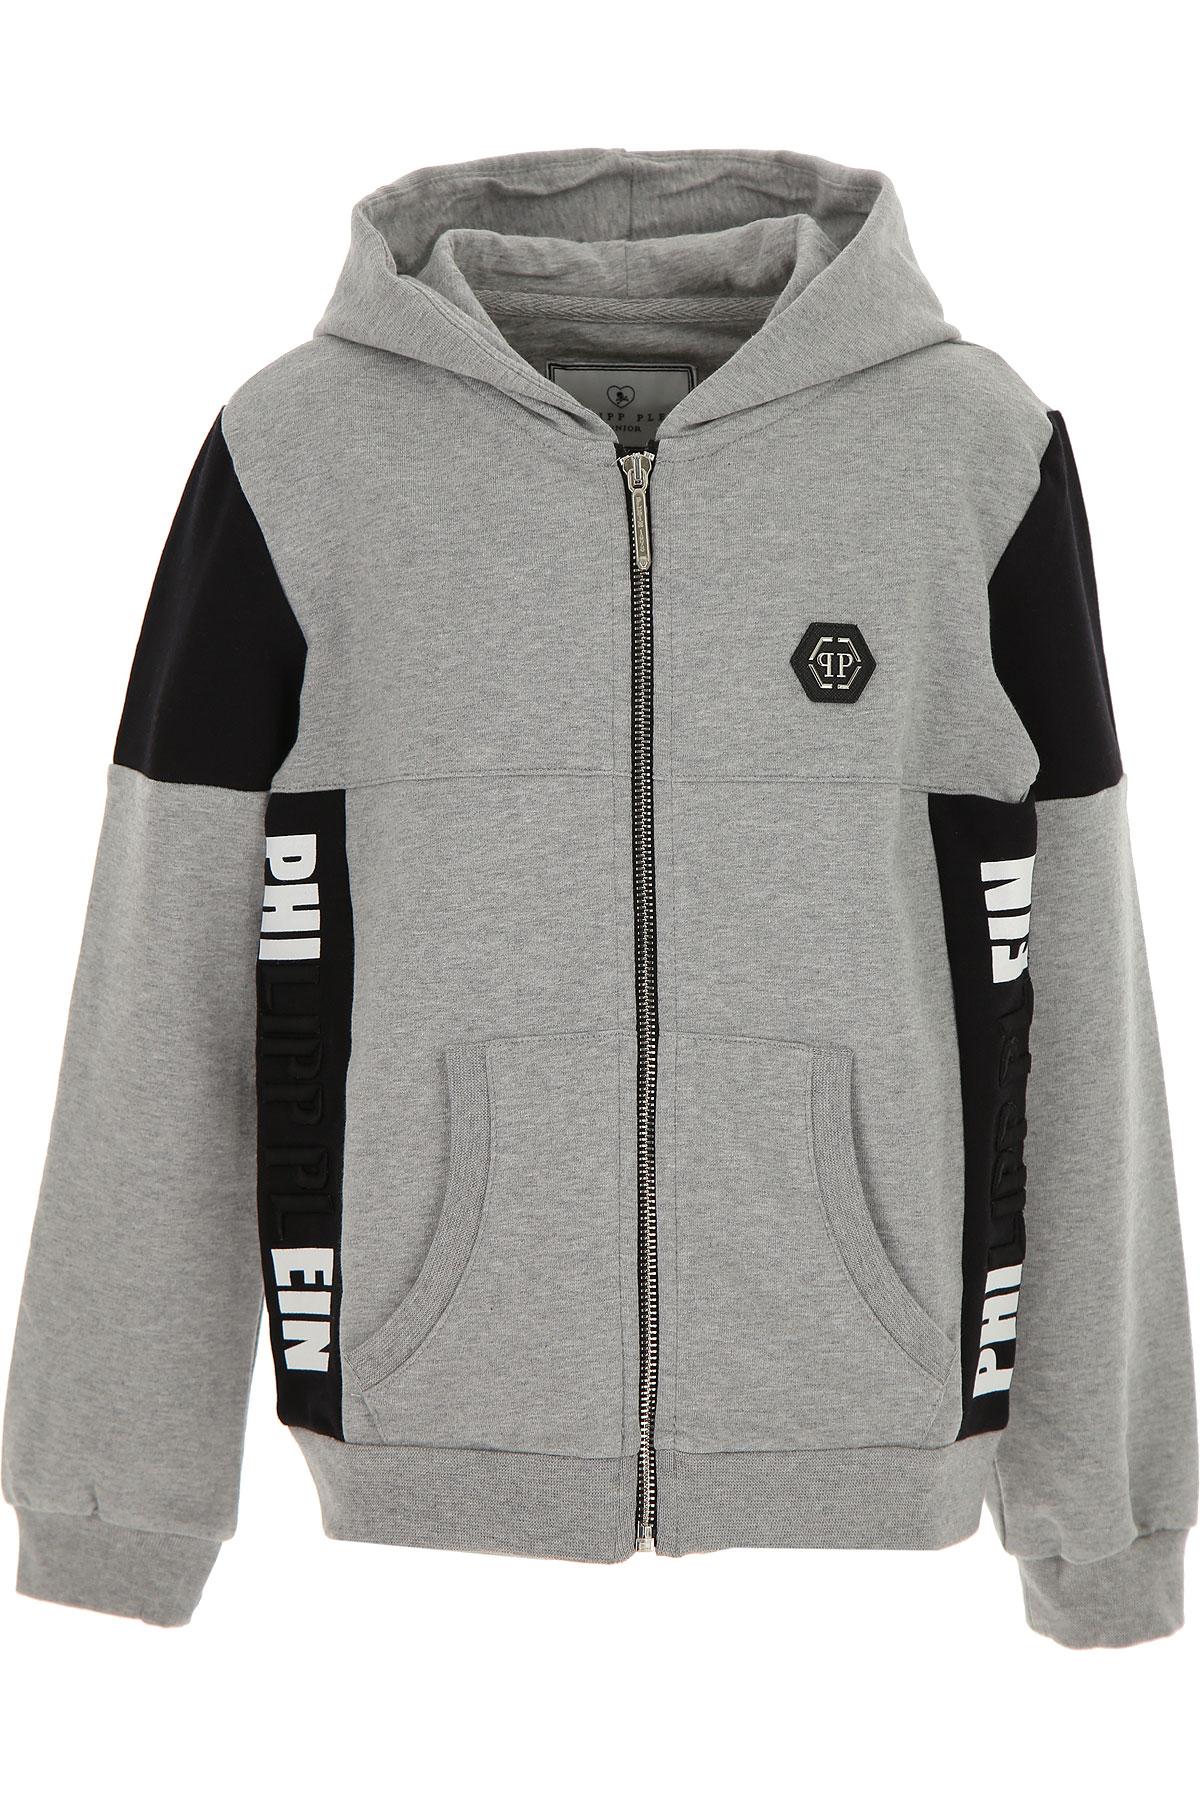 Philipp Plein Kids Sweatshirts & Hoodies for Boys On Sale, Grey, Cotto, 2019, 10Y 12Y 14Y 8Y